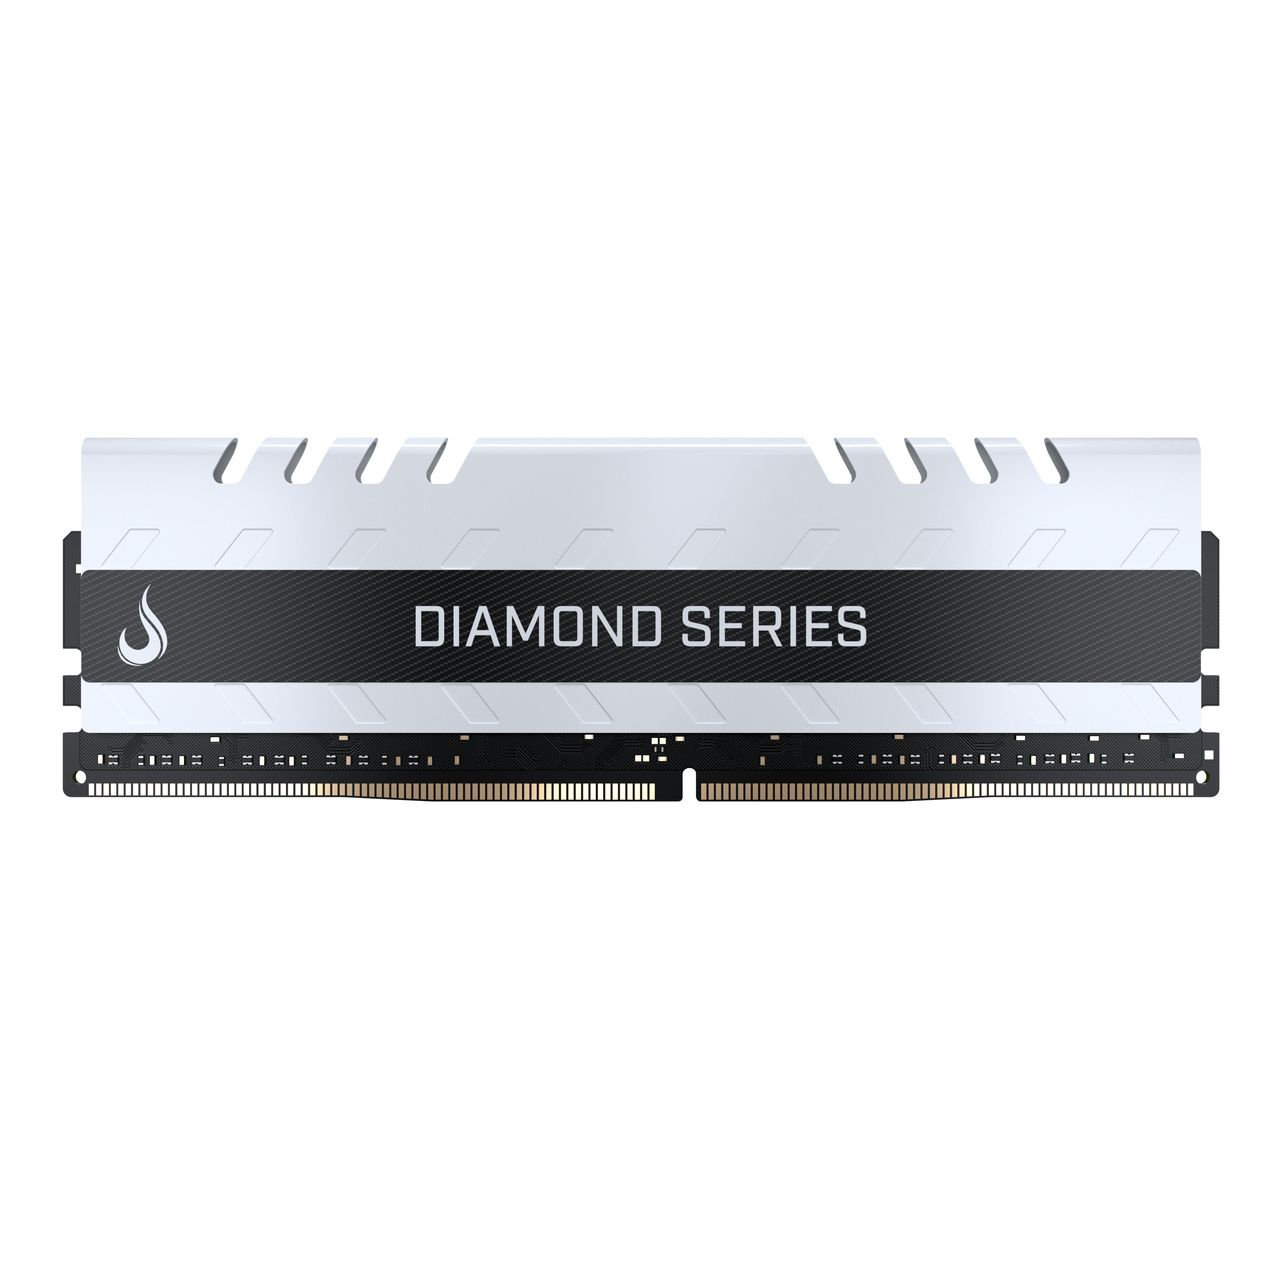 Memoria Ram DDR4 8GB 3000MHZ Diamond - RM-D4-8G-3000D WHITE  - Loja Rise Mode